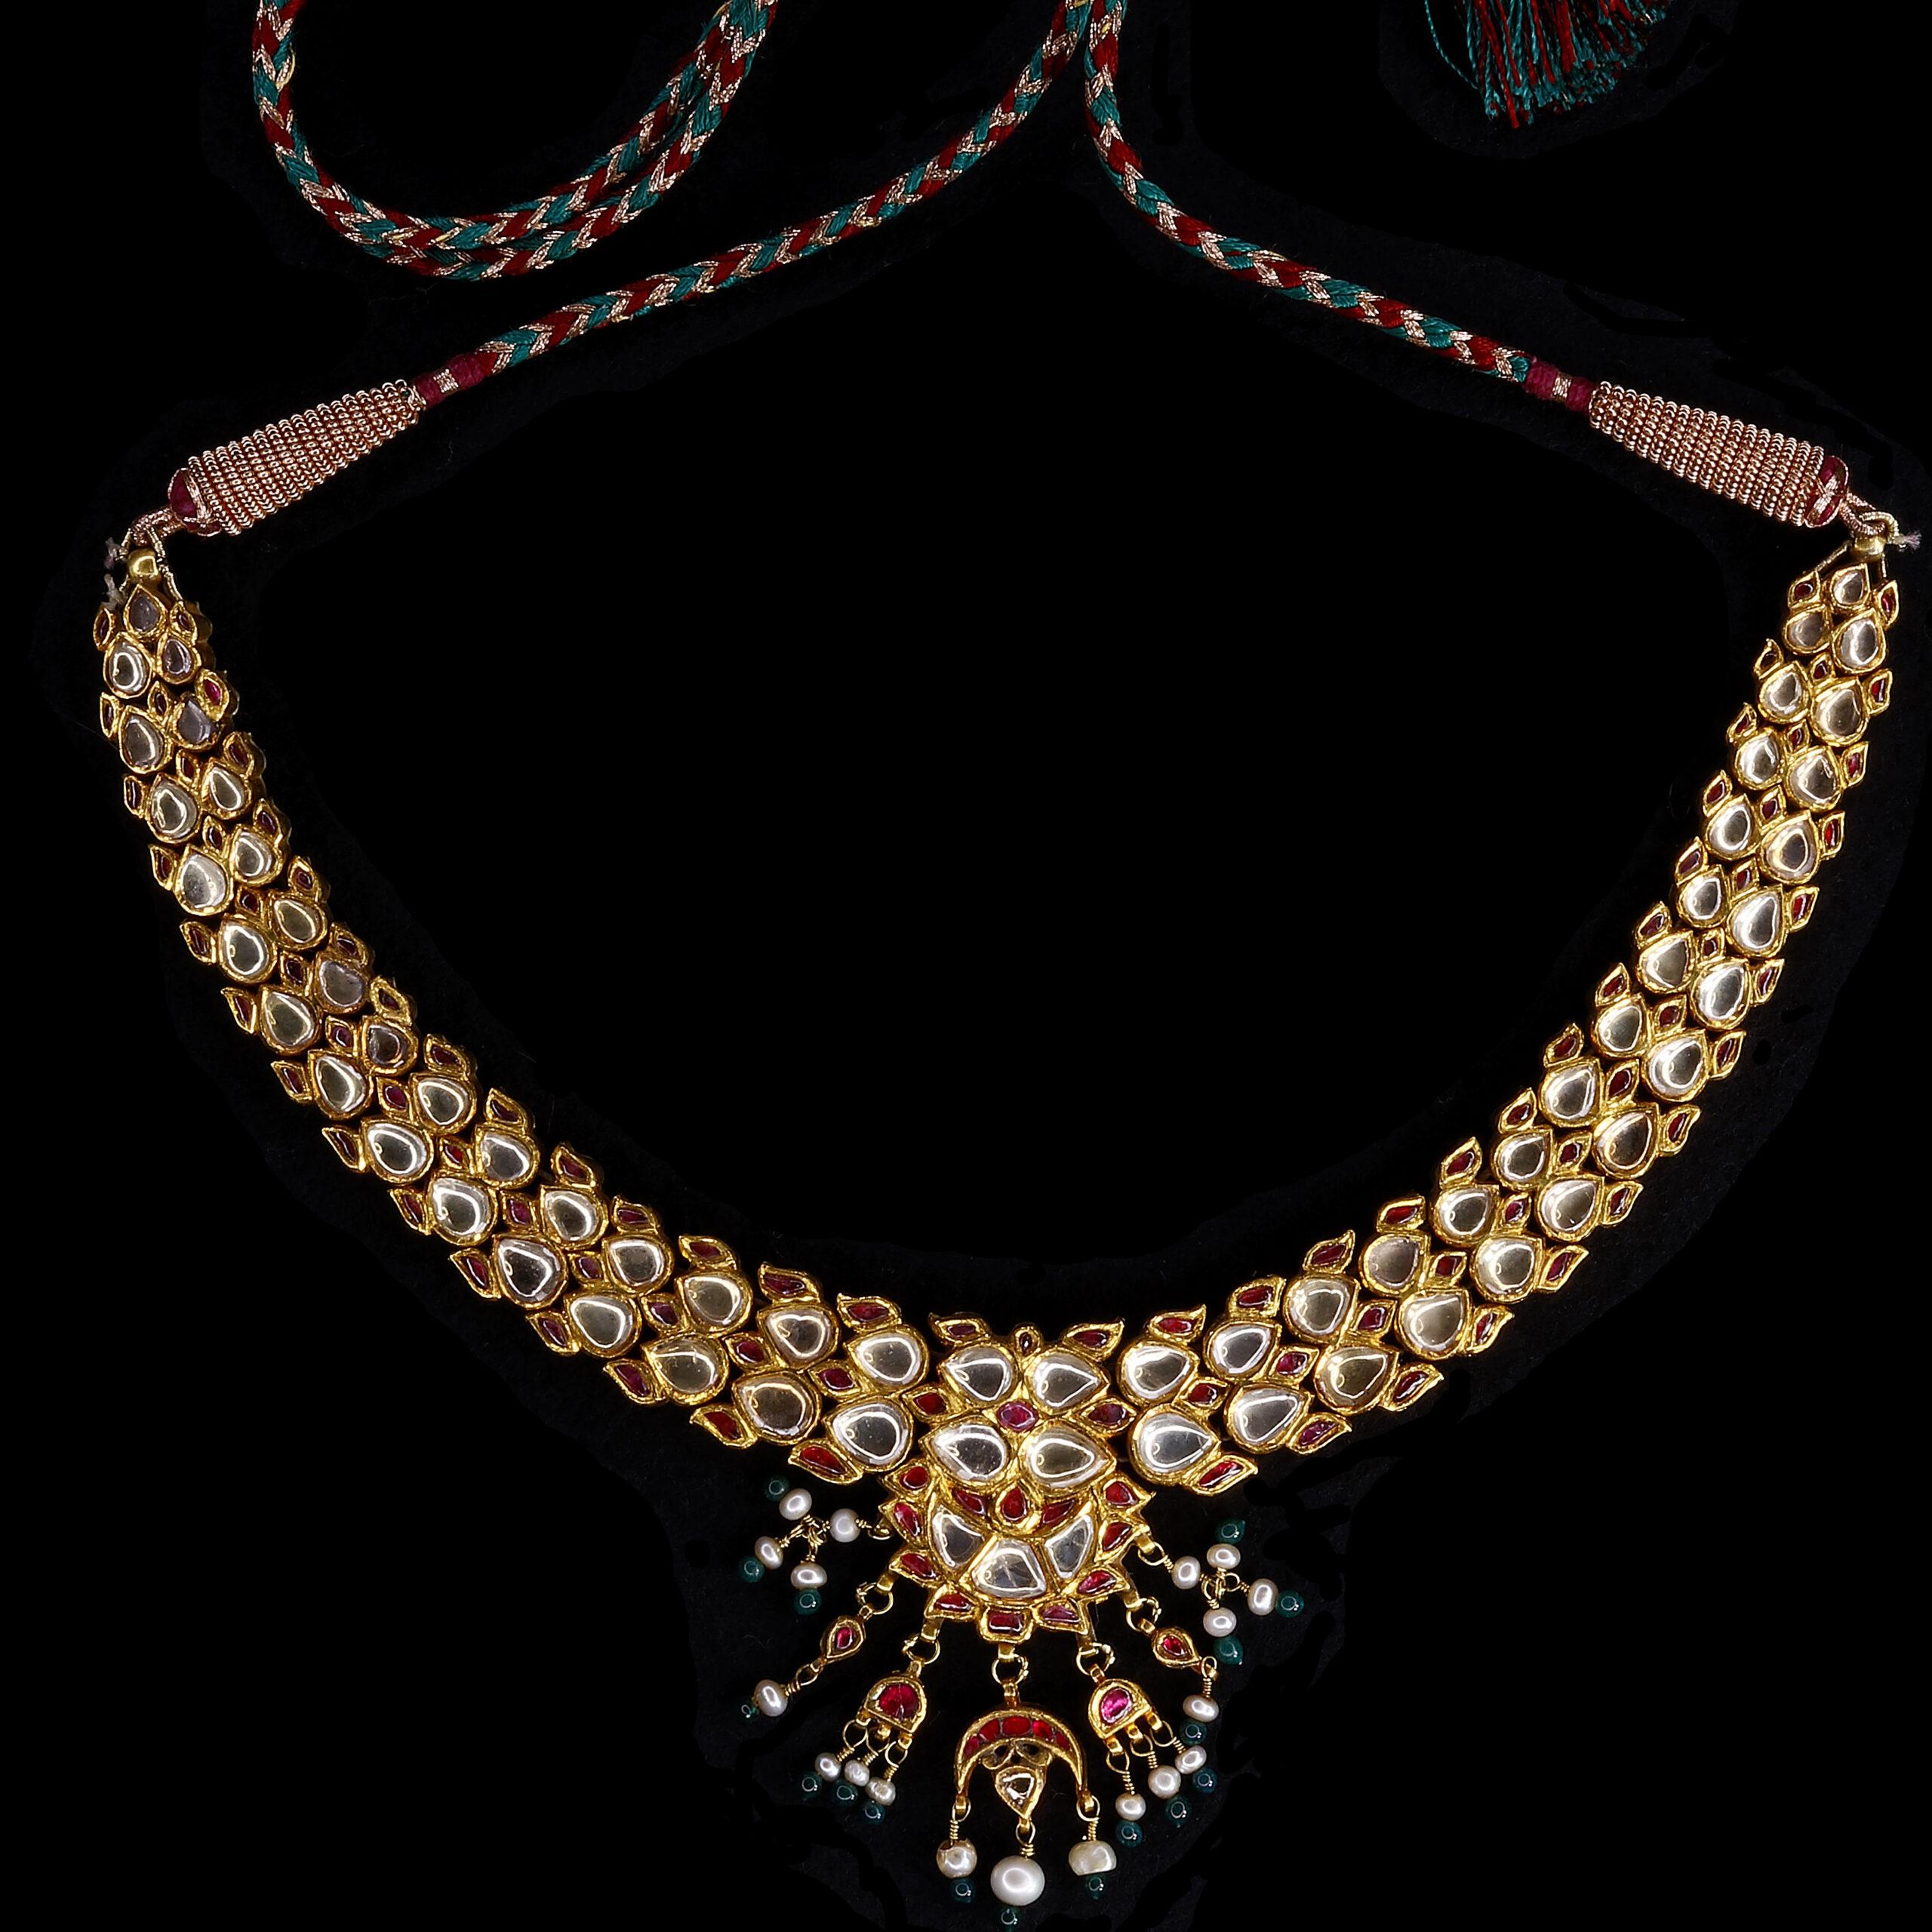 White Sapphire Necklace India 19th Century